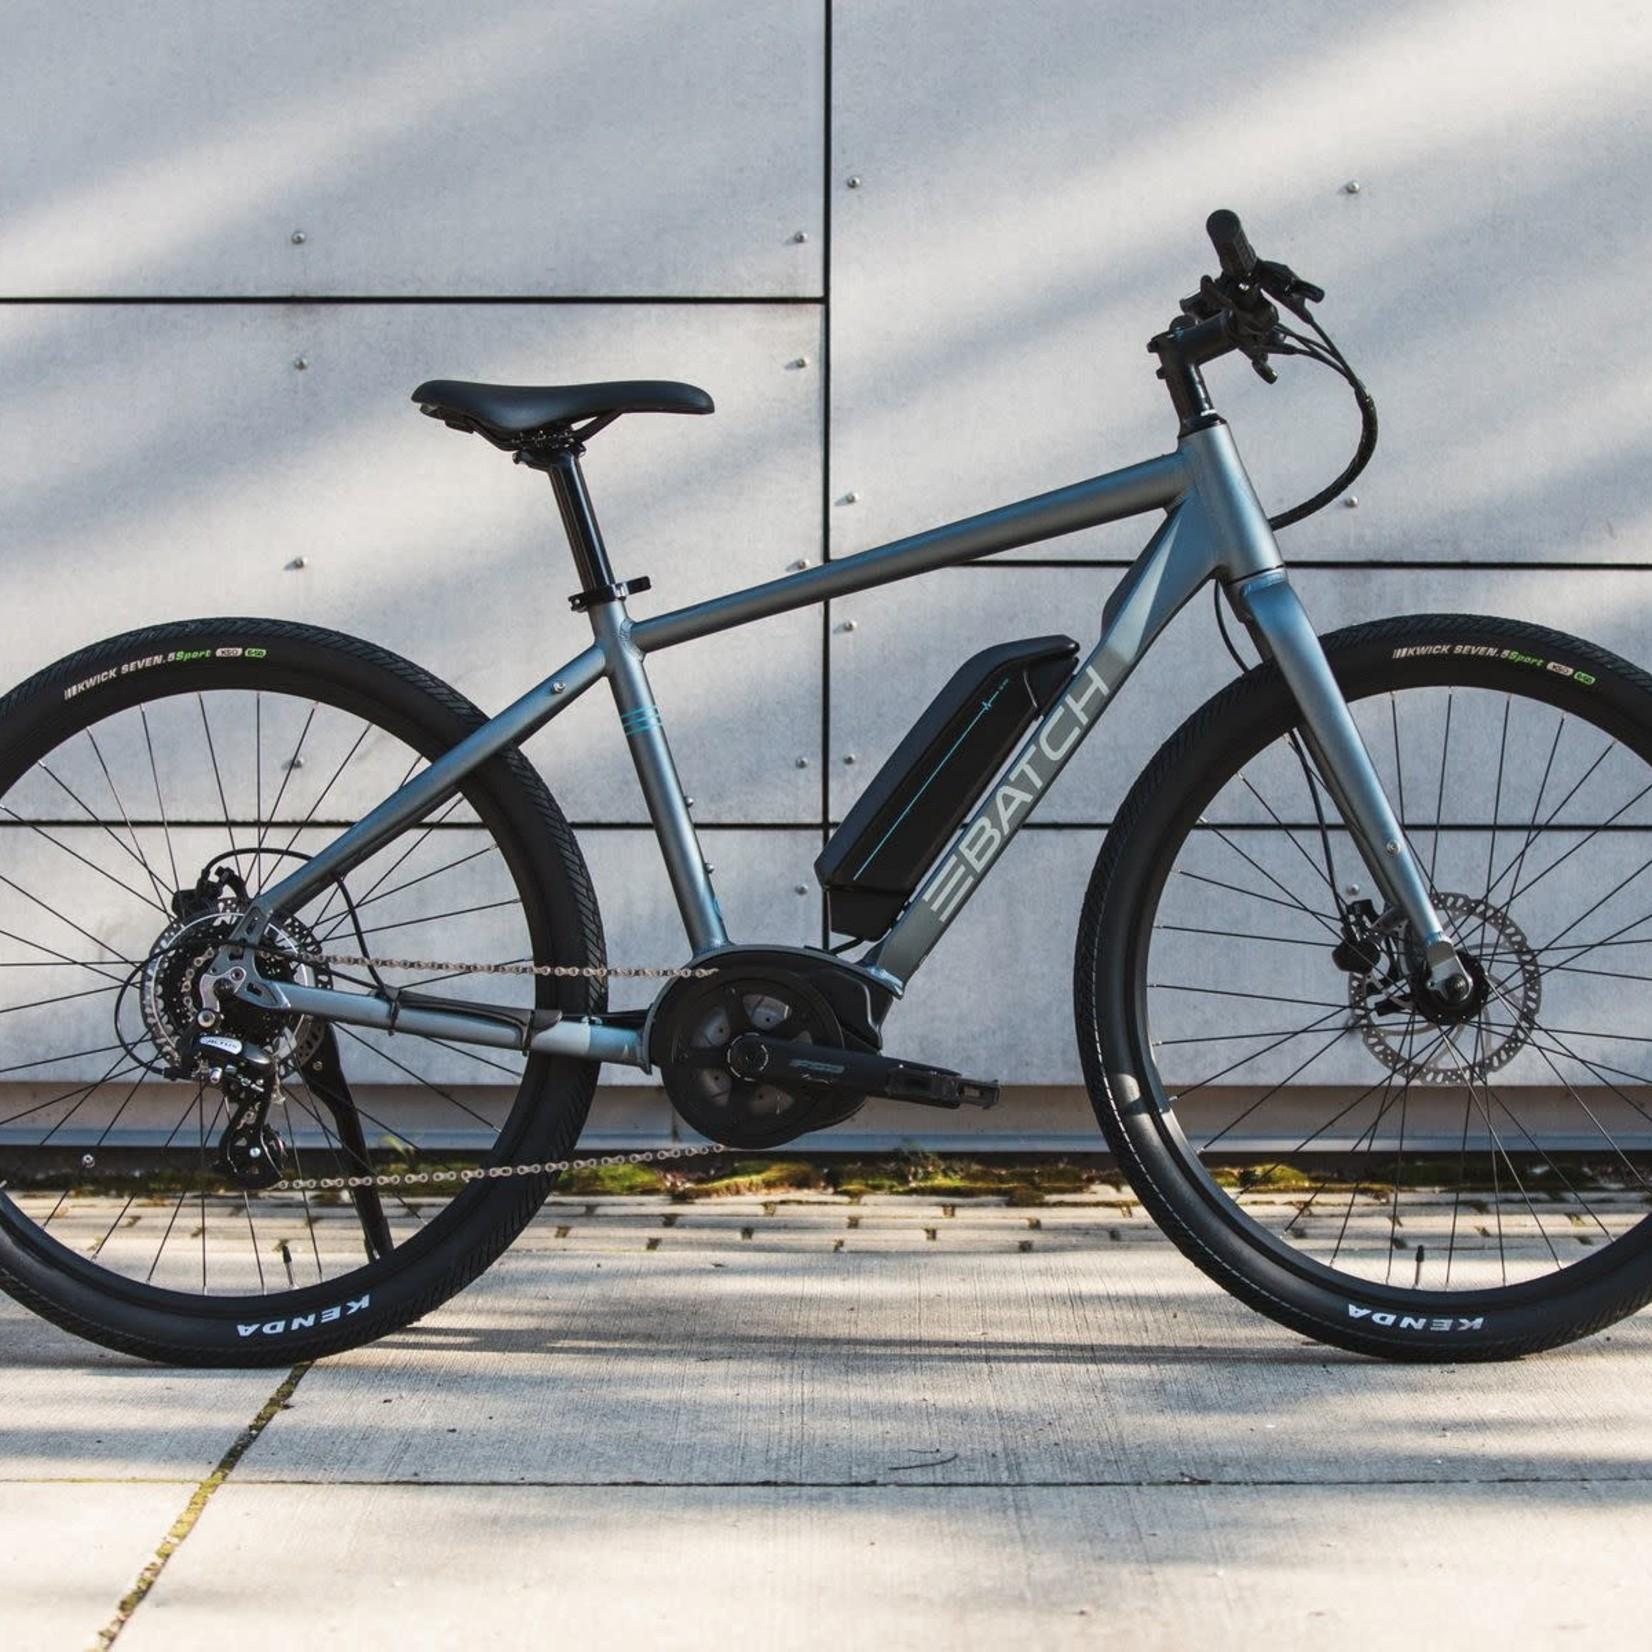 Batch Batch the E-Bike